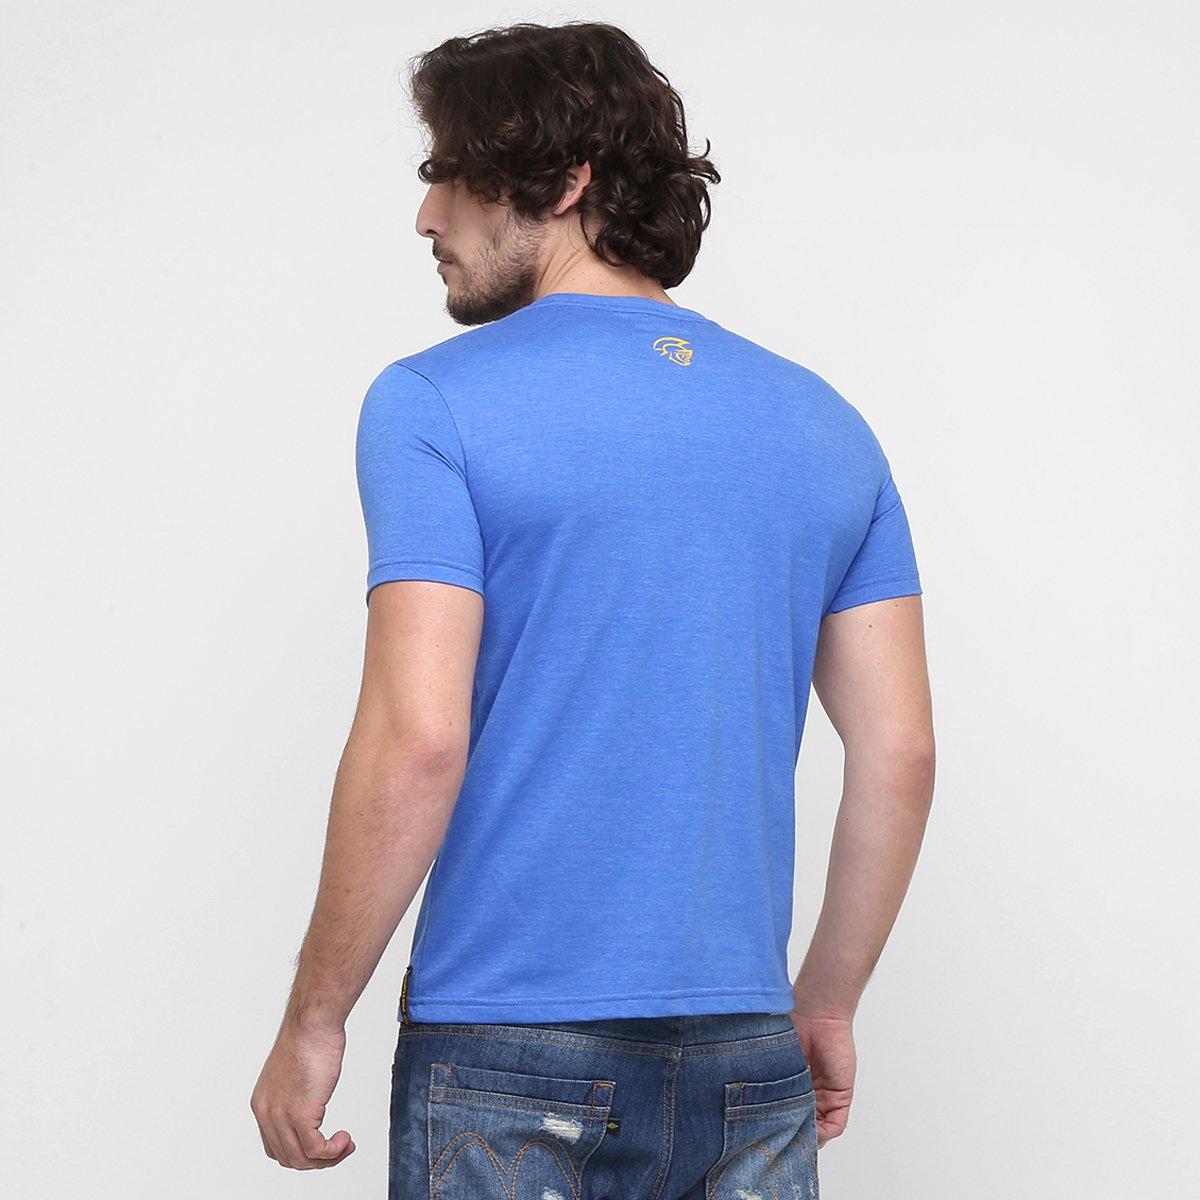 Camiseta Pretorian Stop Whishing Masculina  Camiseta Pretorian Stop  Whishing Masculina ... 8e33e69cf2891